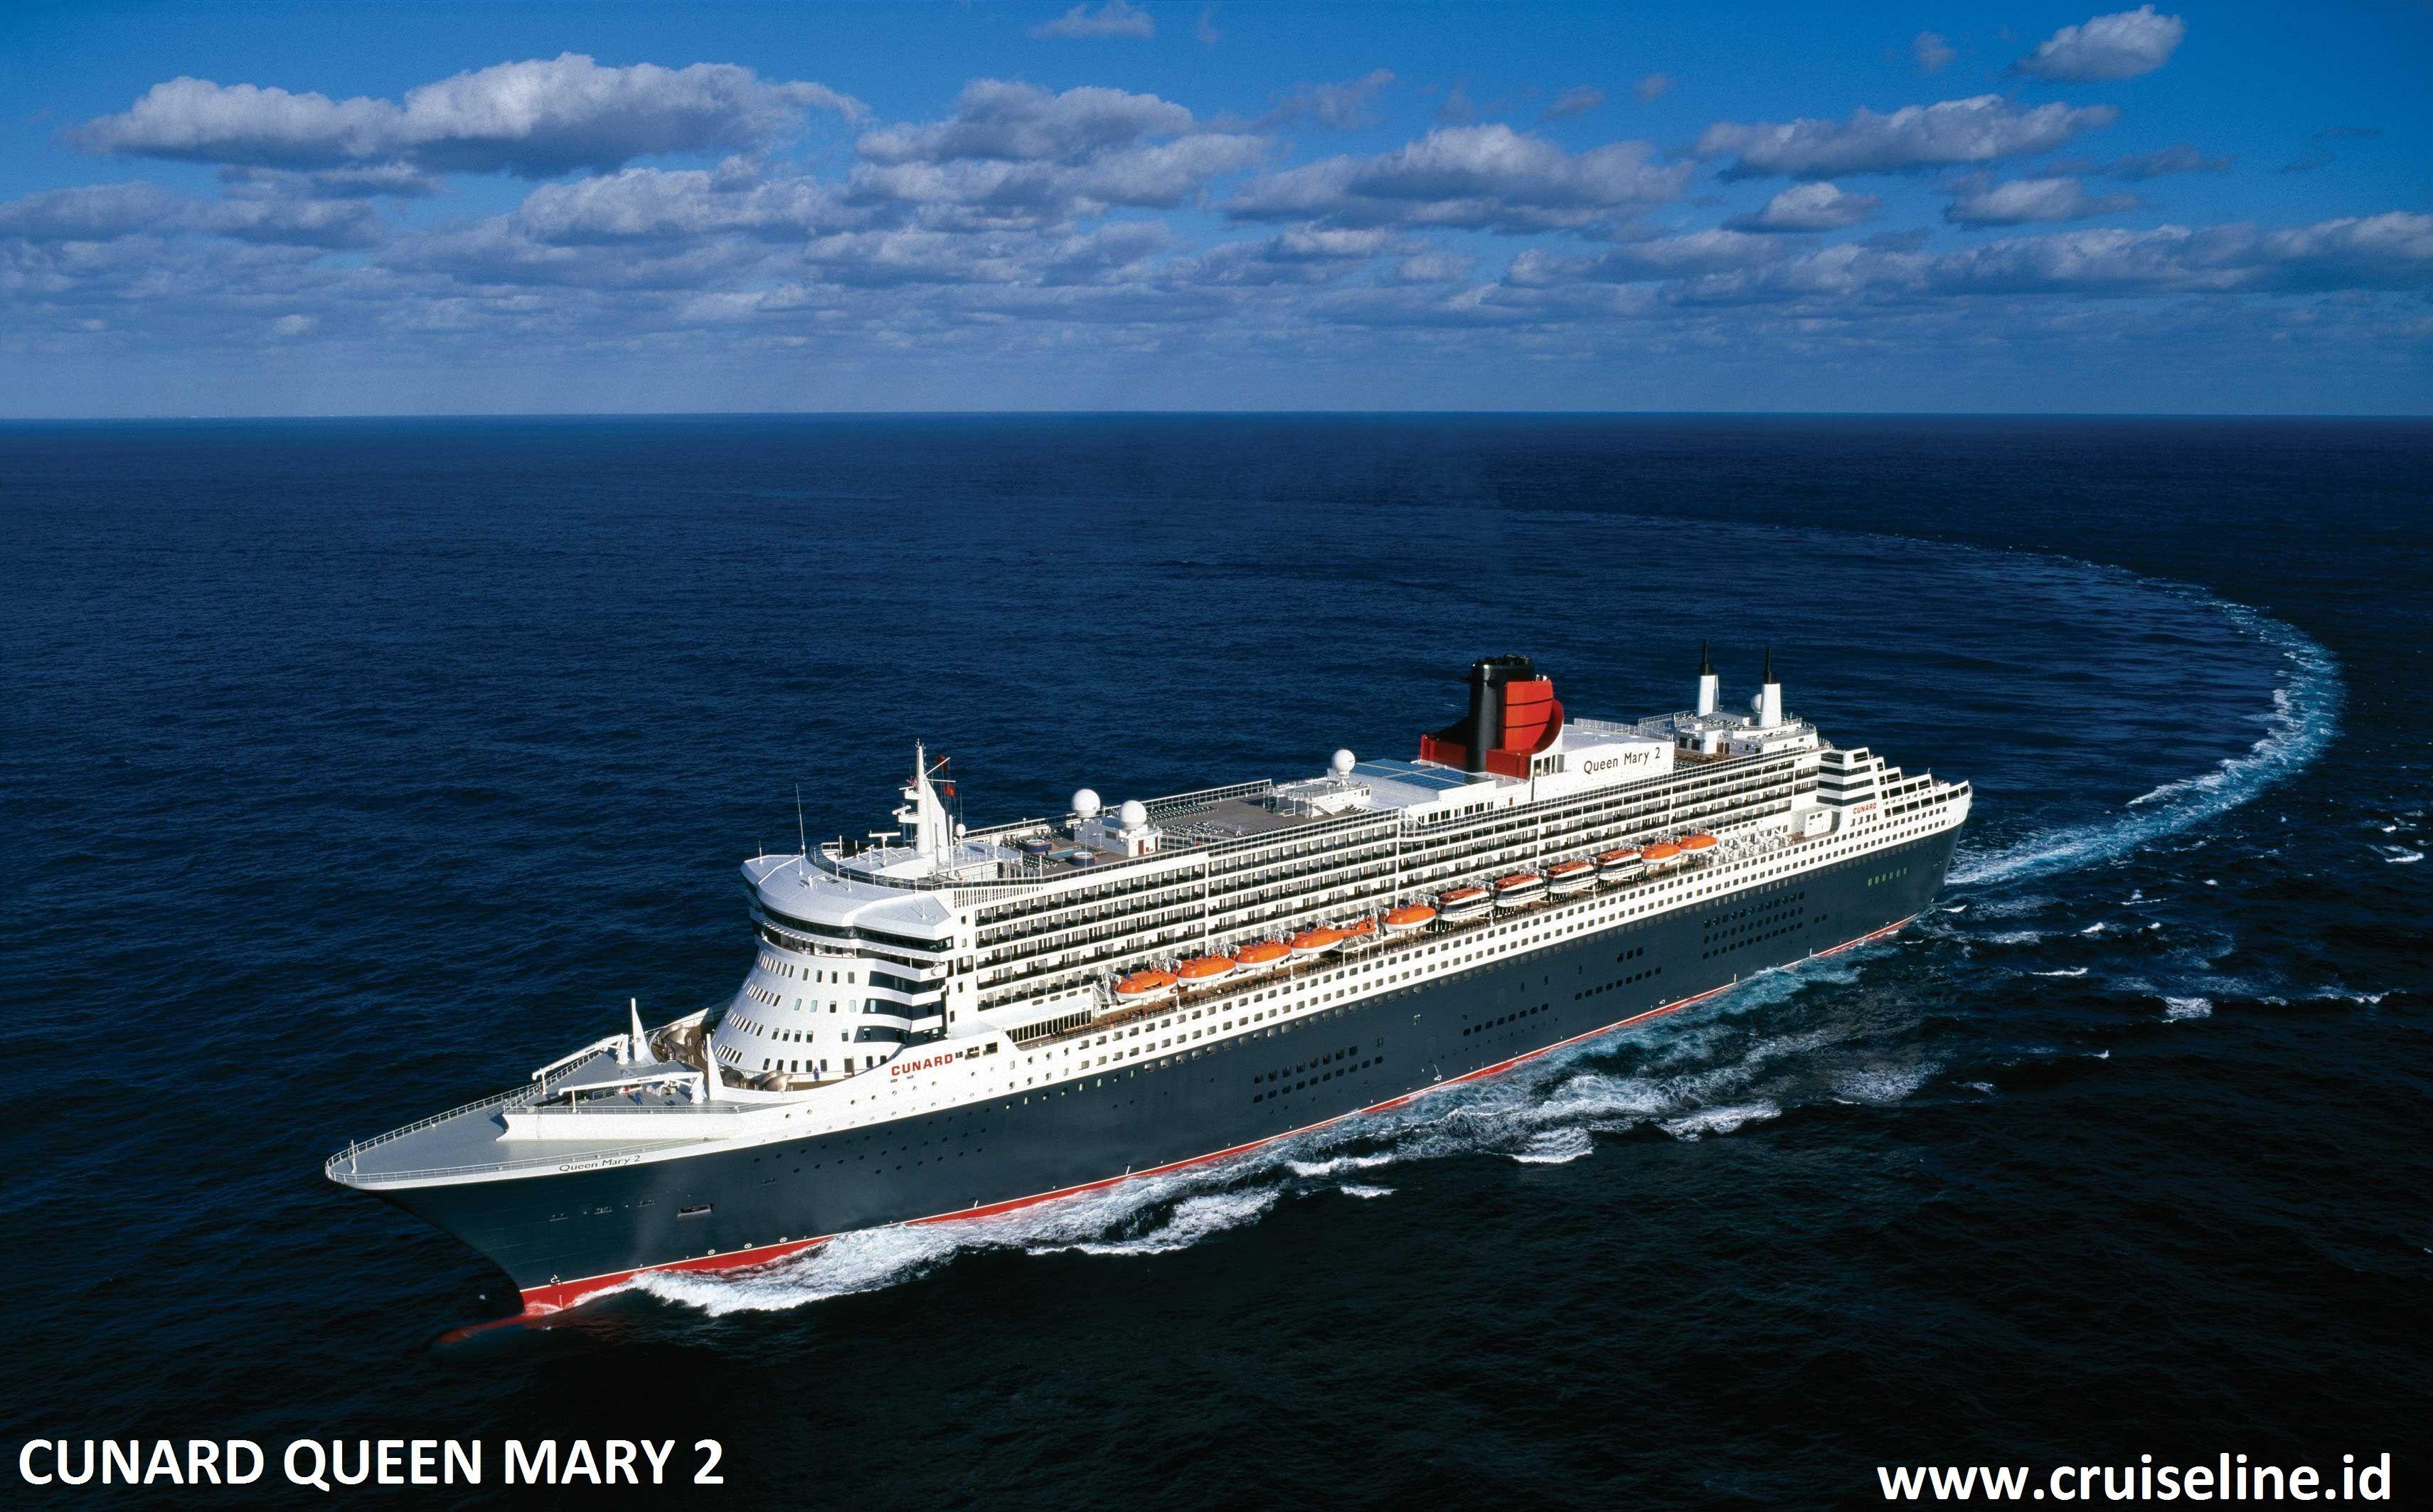 Cunard Queen Mary 2 Kapal Pesiar Pesiar Kapal